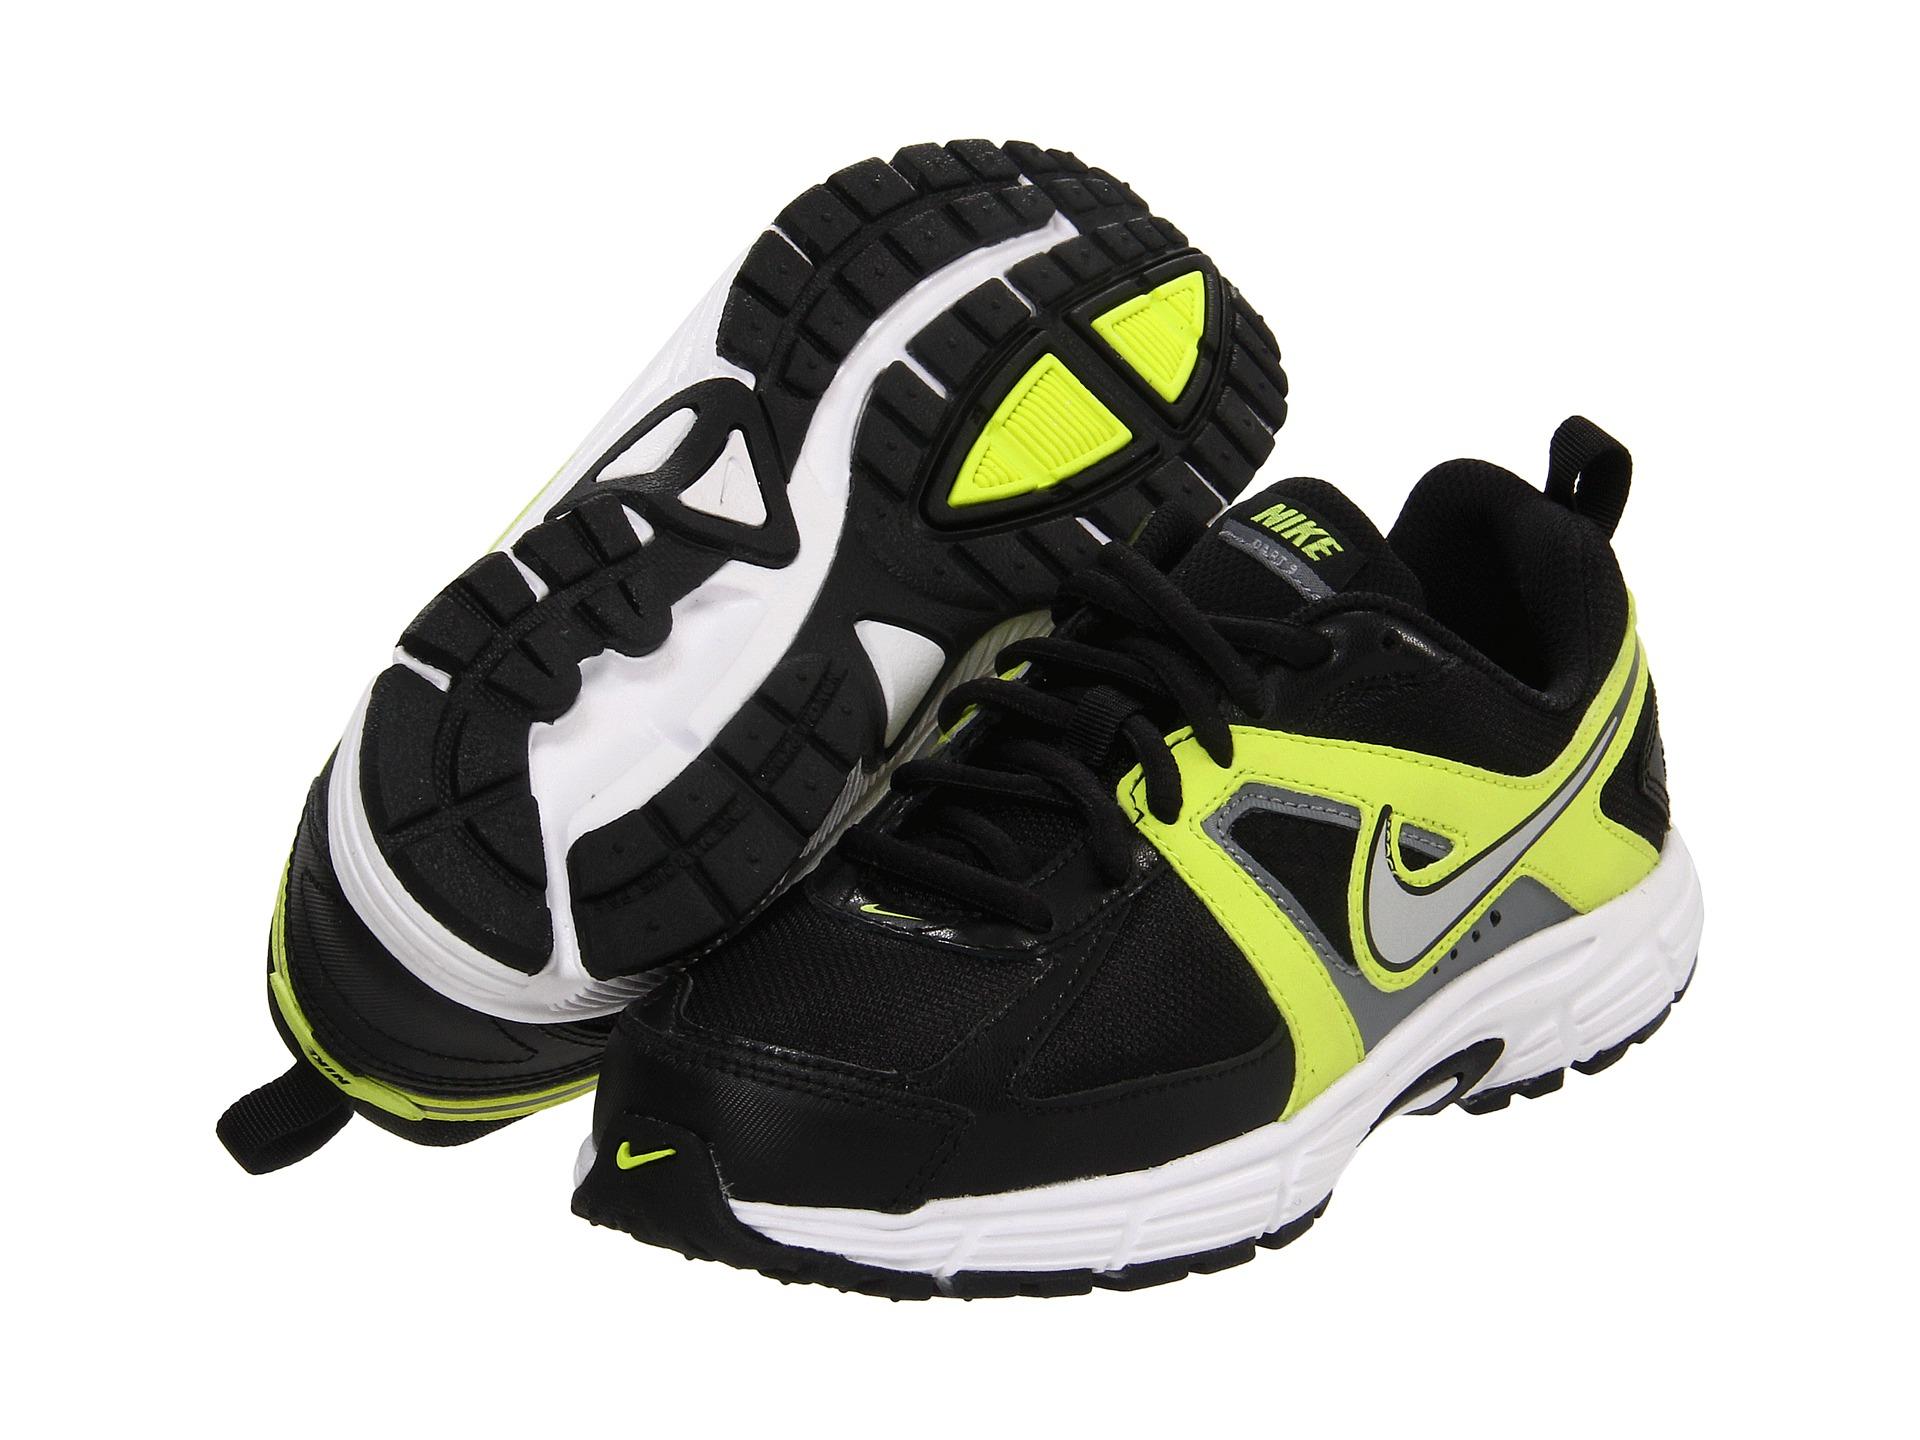 brand new 02792 ee423 Nike Kids Dart 9 Lace (Toddler Youth) Black Cyber Cool Grey Metallic